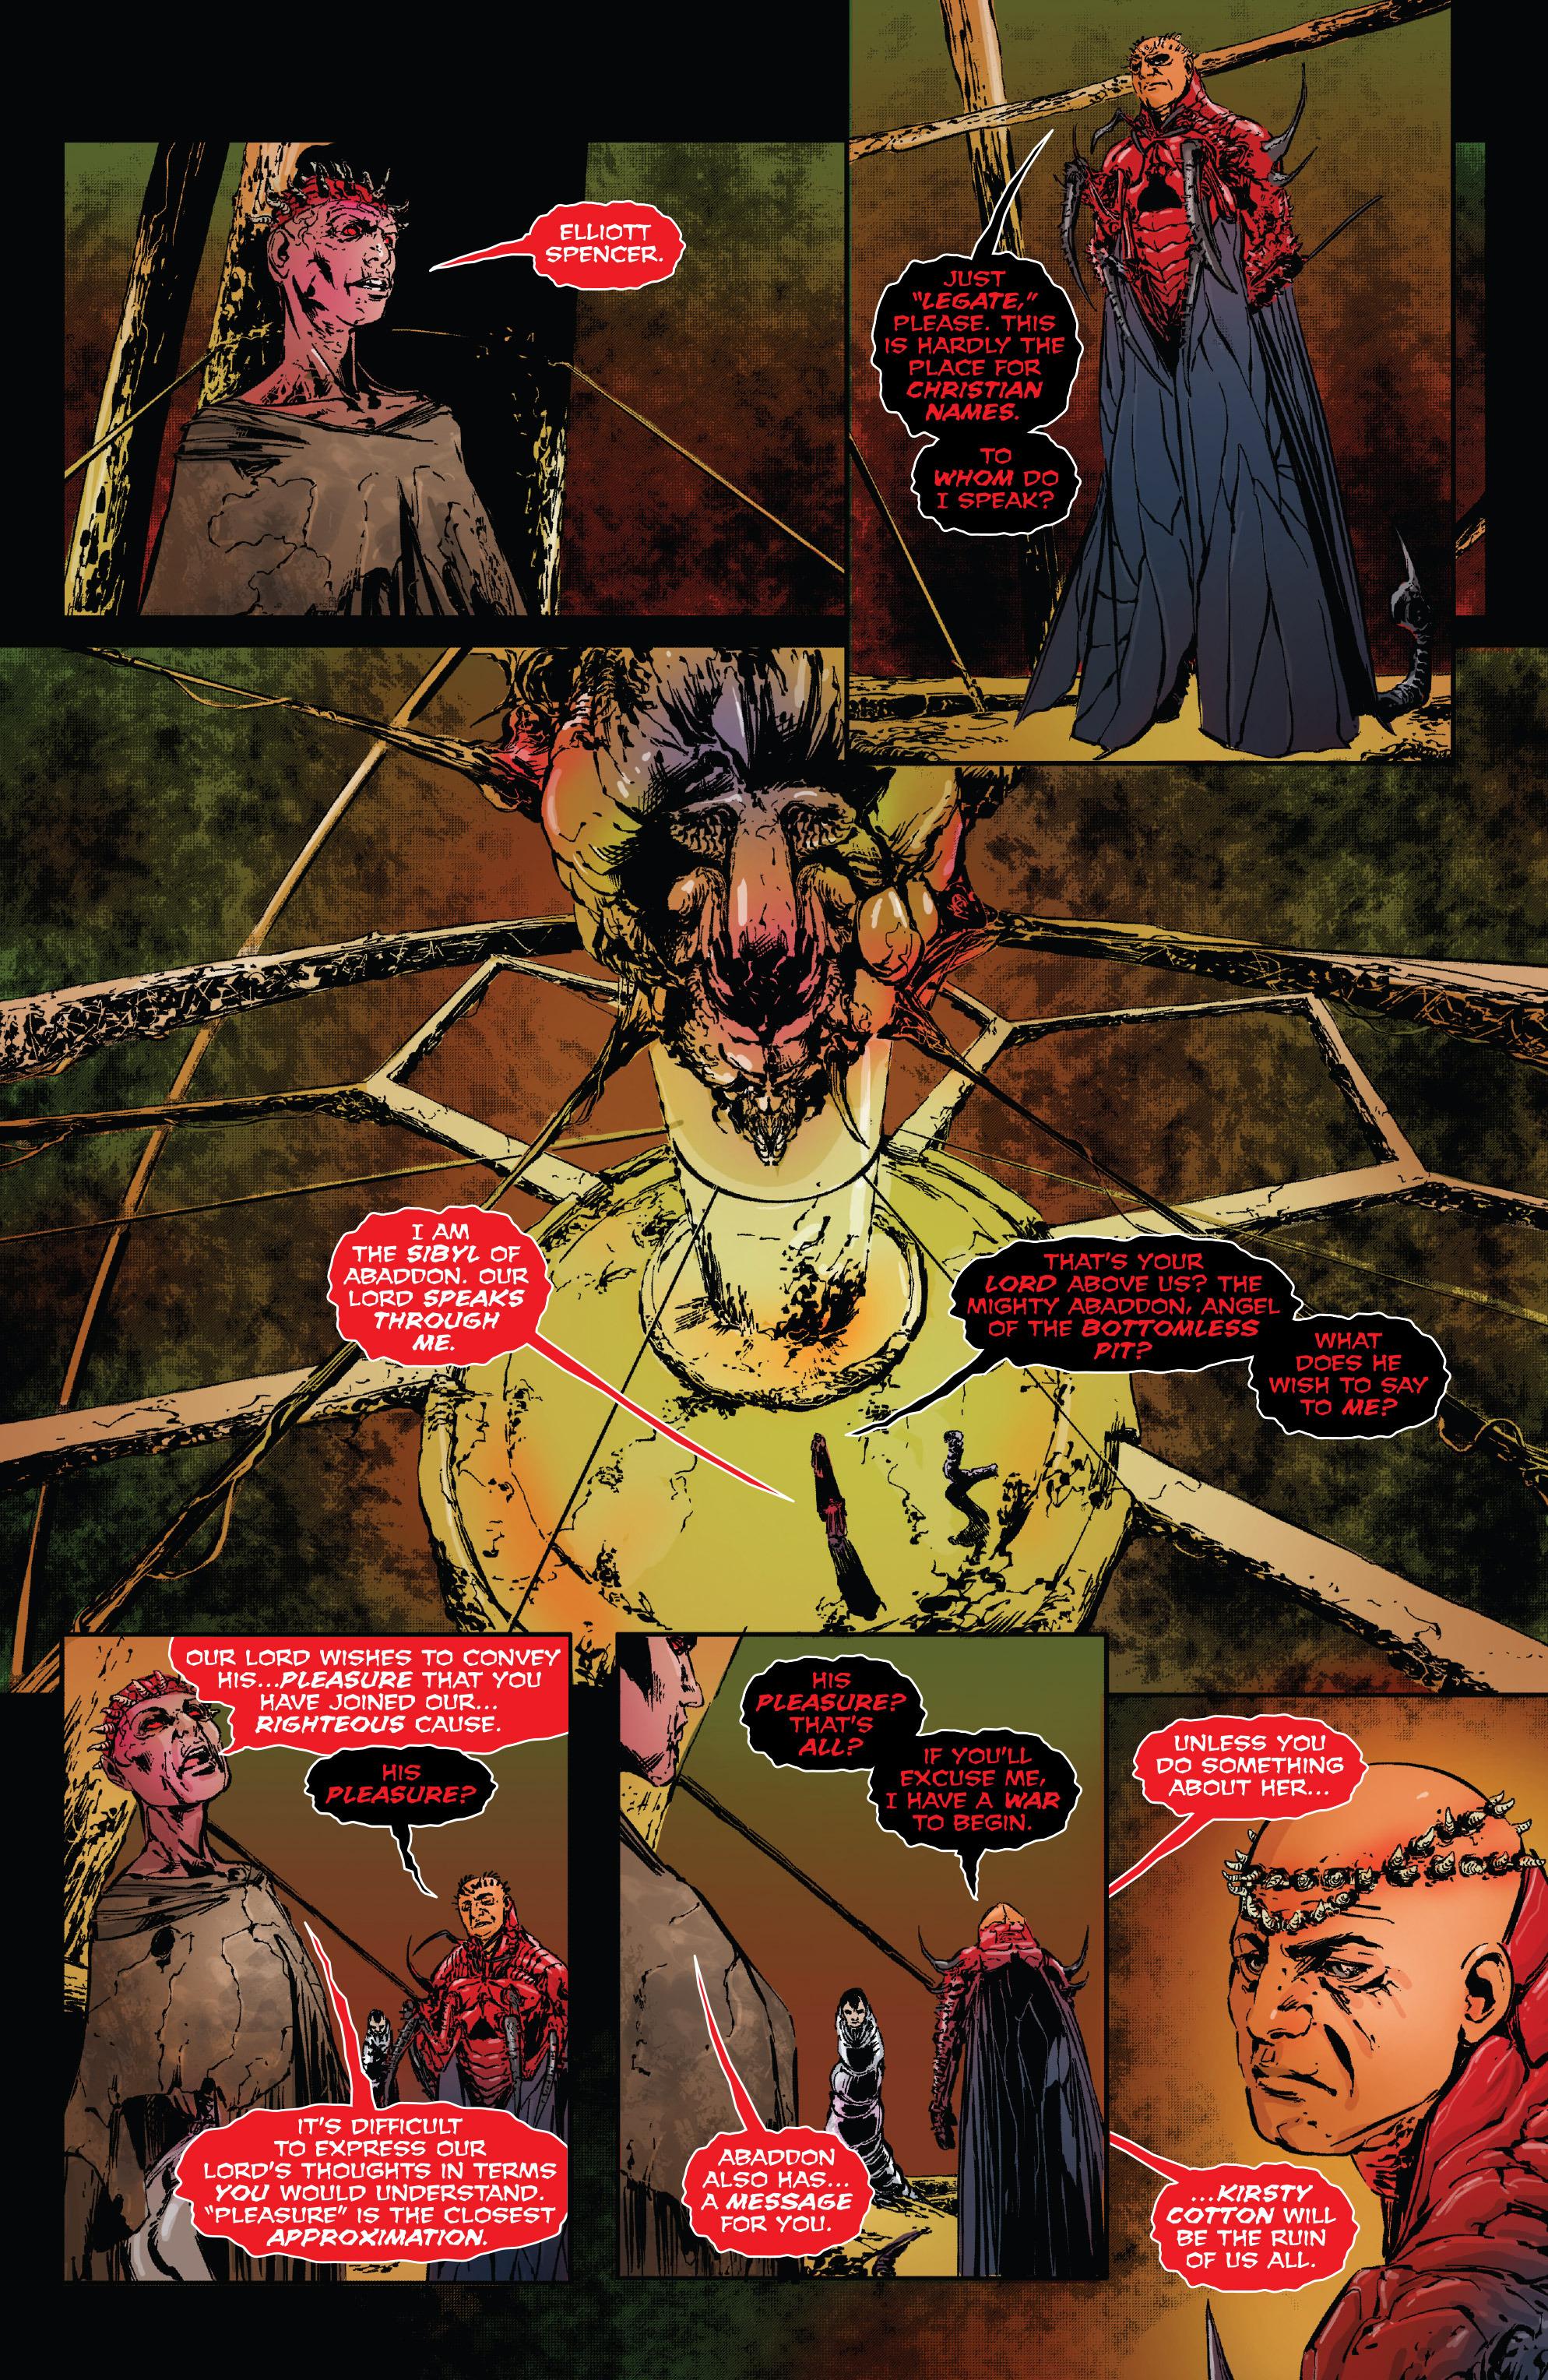 Read online Clive Barker's Hellraiser: The Dark Watch comic -  Issue # TPB 3 - 44